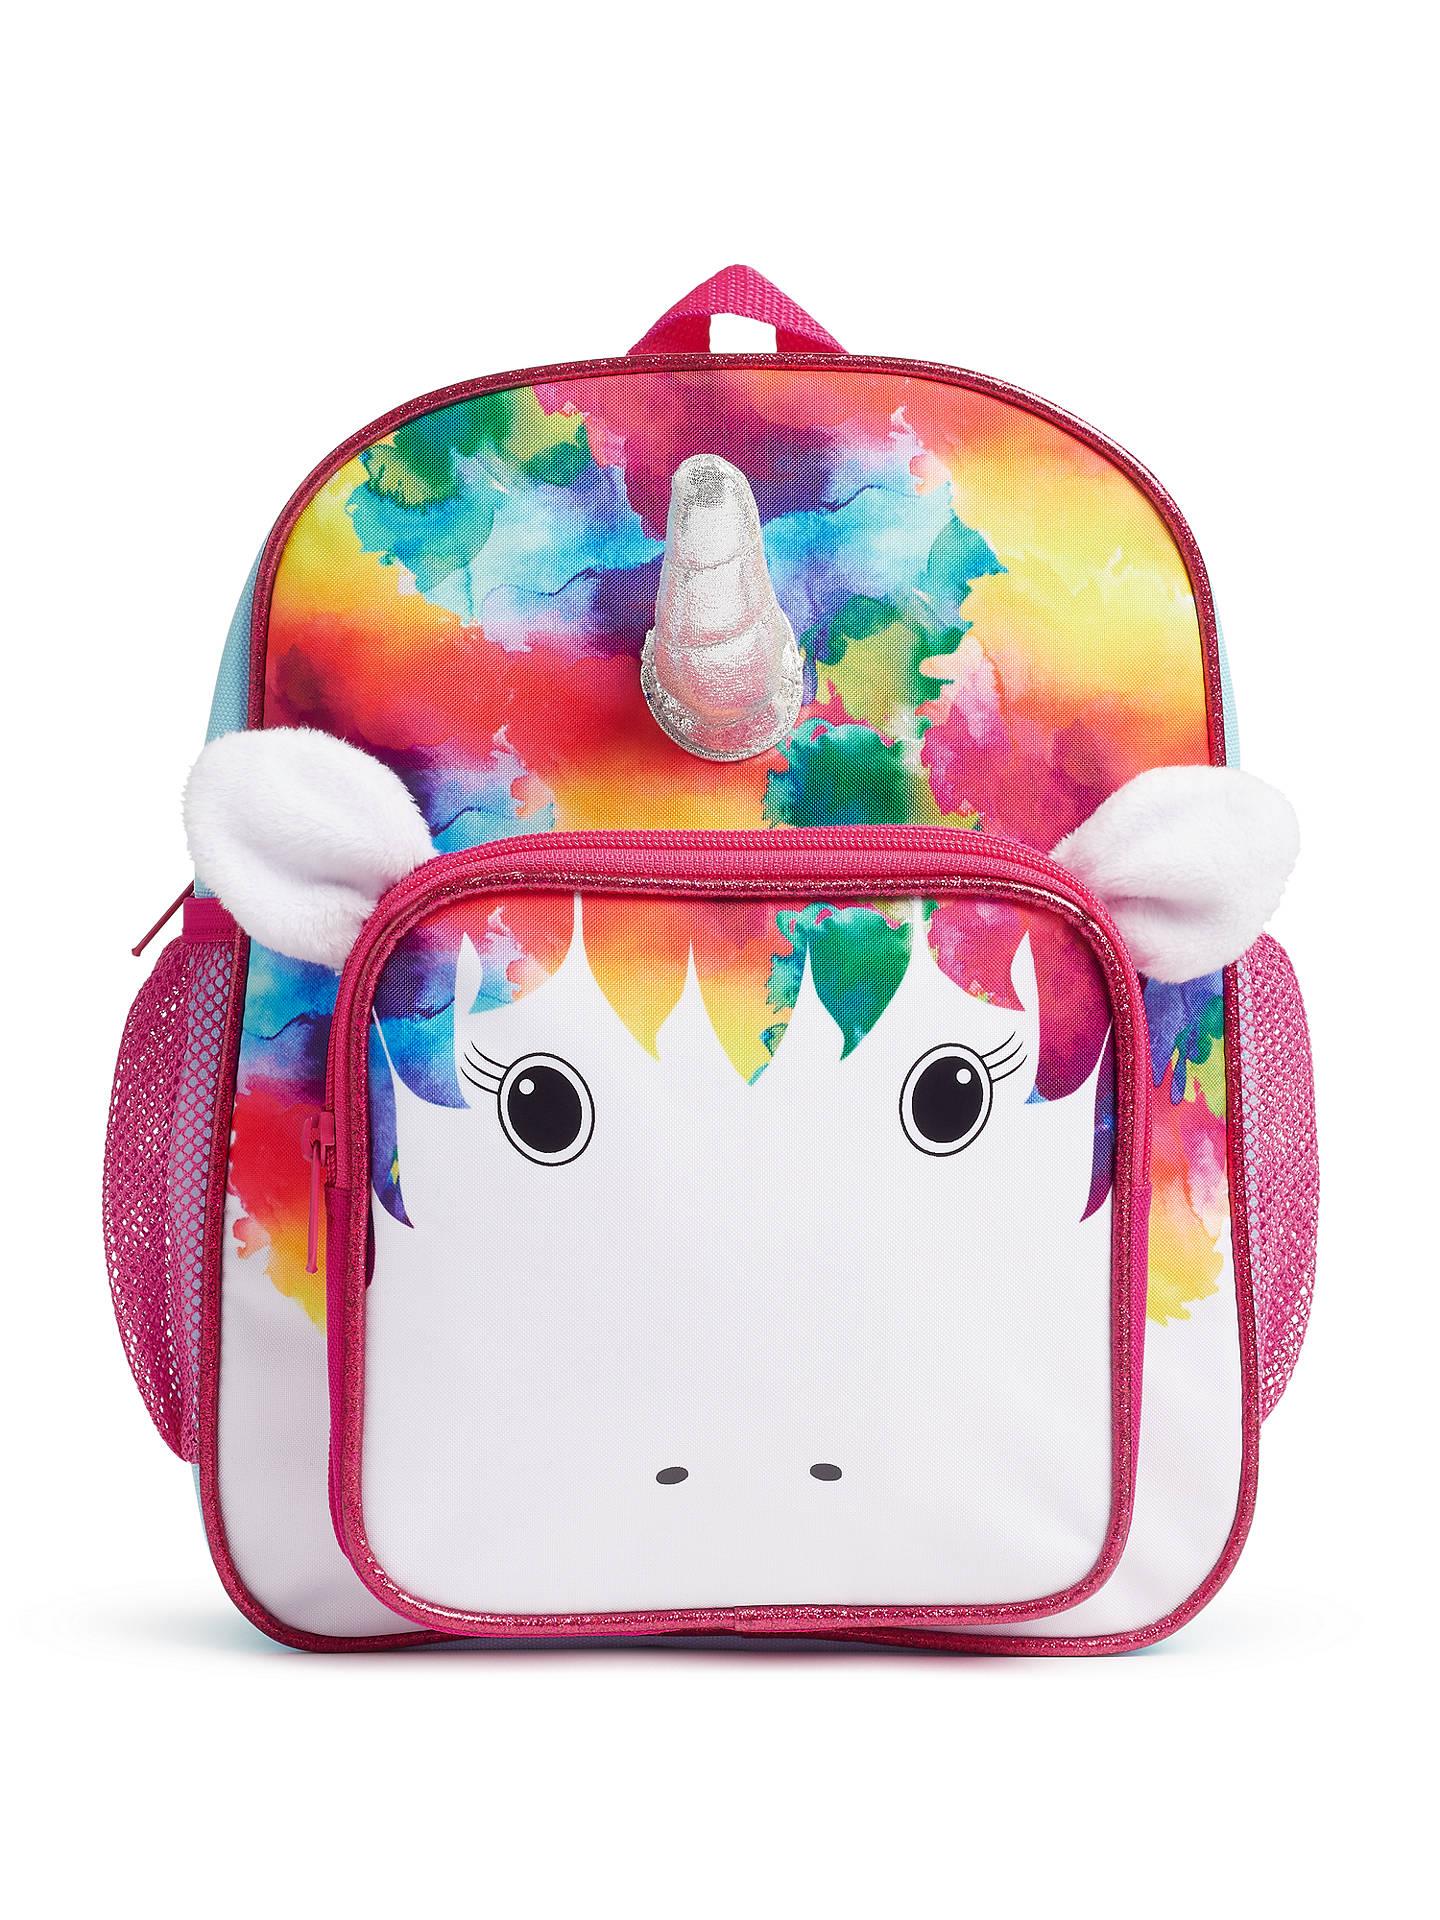 BuyJohn Lewis   Partners Unicorn Children s Backpack 0ffc92ebbf4af